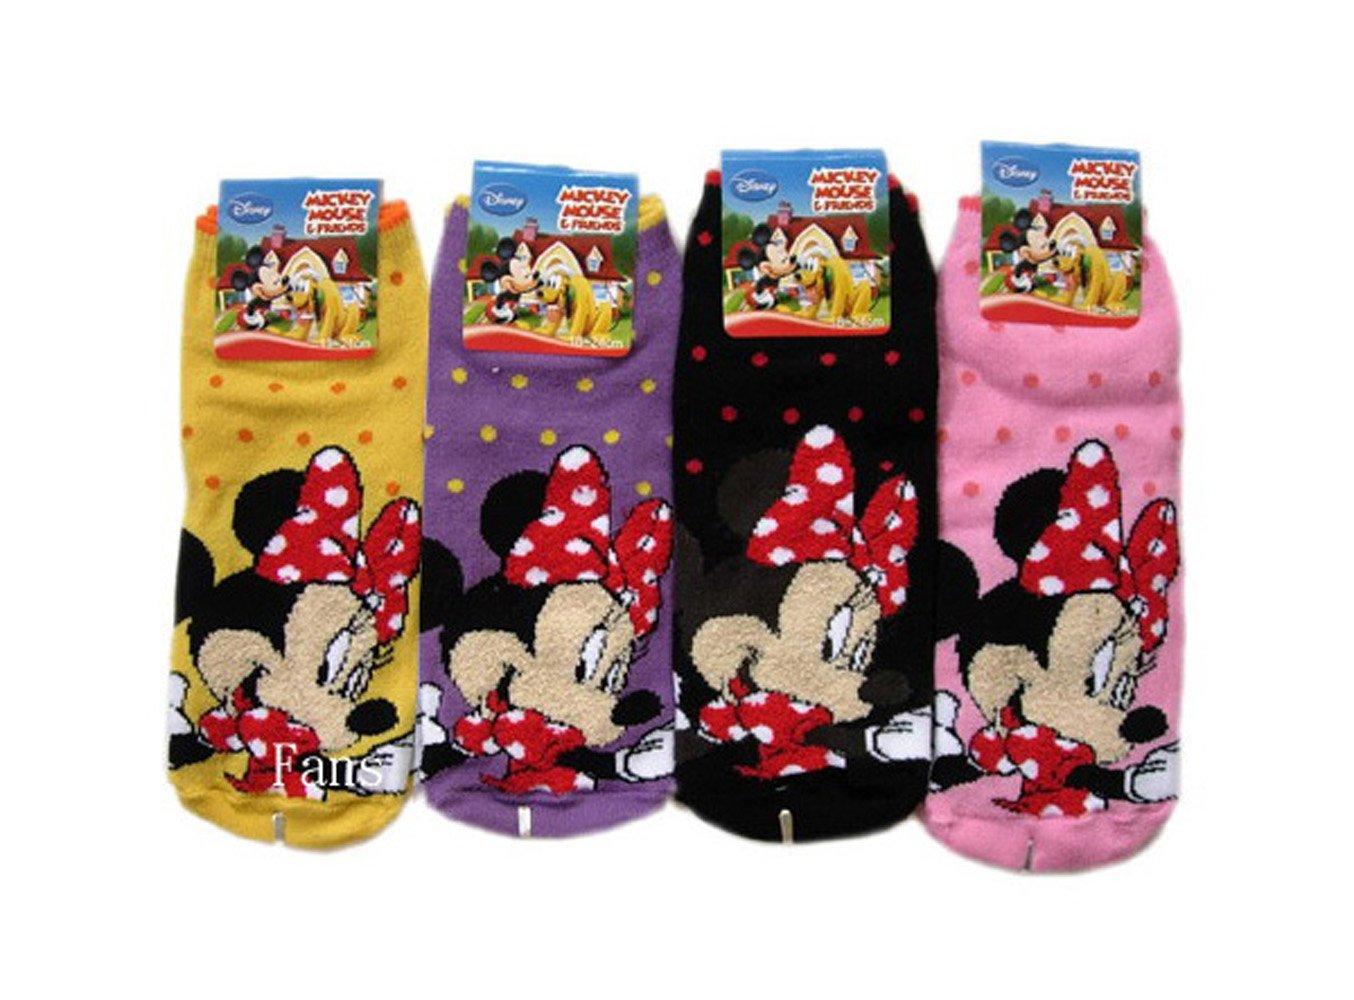 Assorted Childrens Socks Size 9-11 2 Piece Minnie Mouse Socks